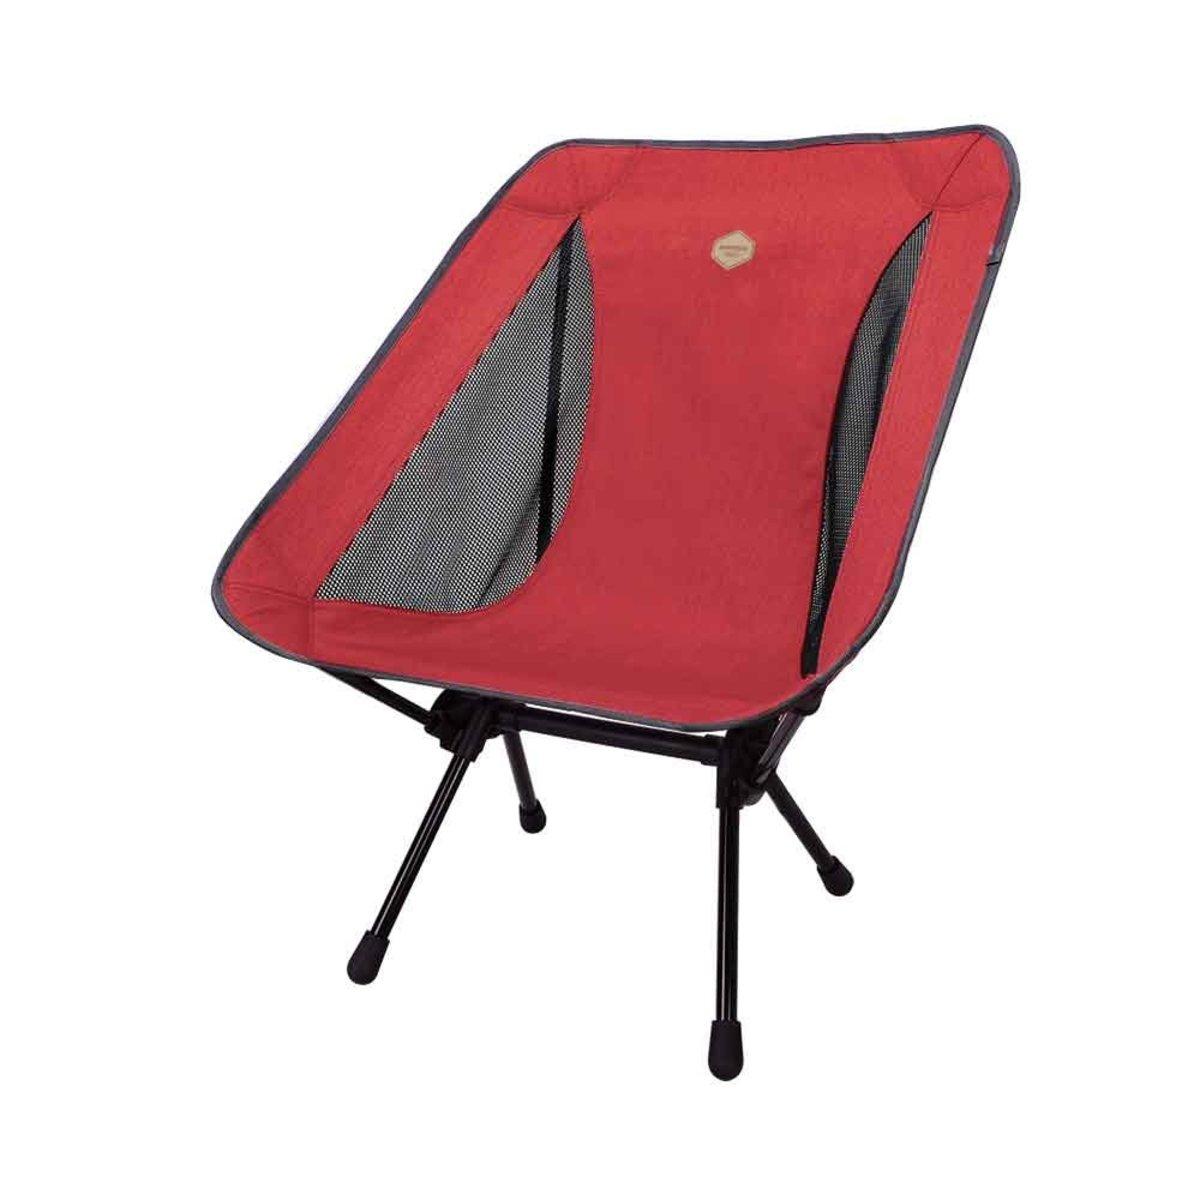 韓國露營椅 Lasse Chair Plus Red